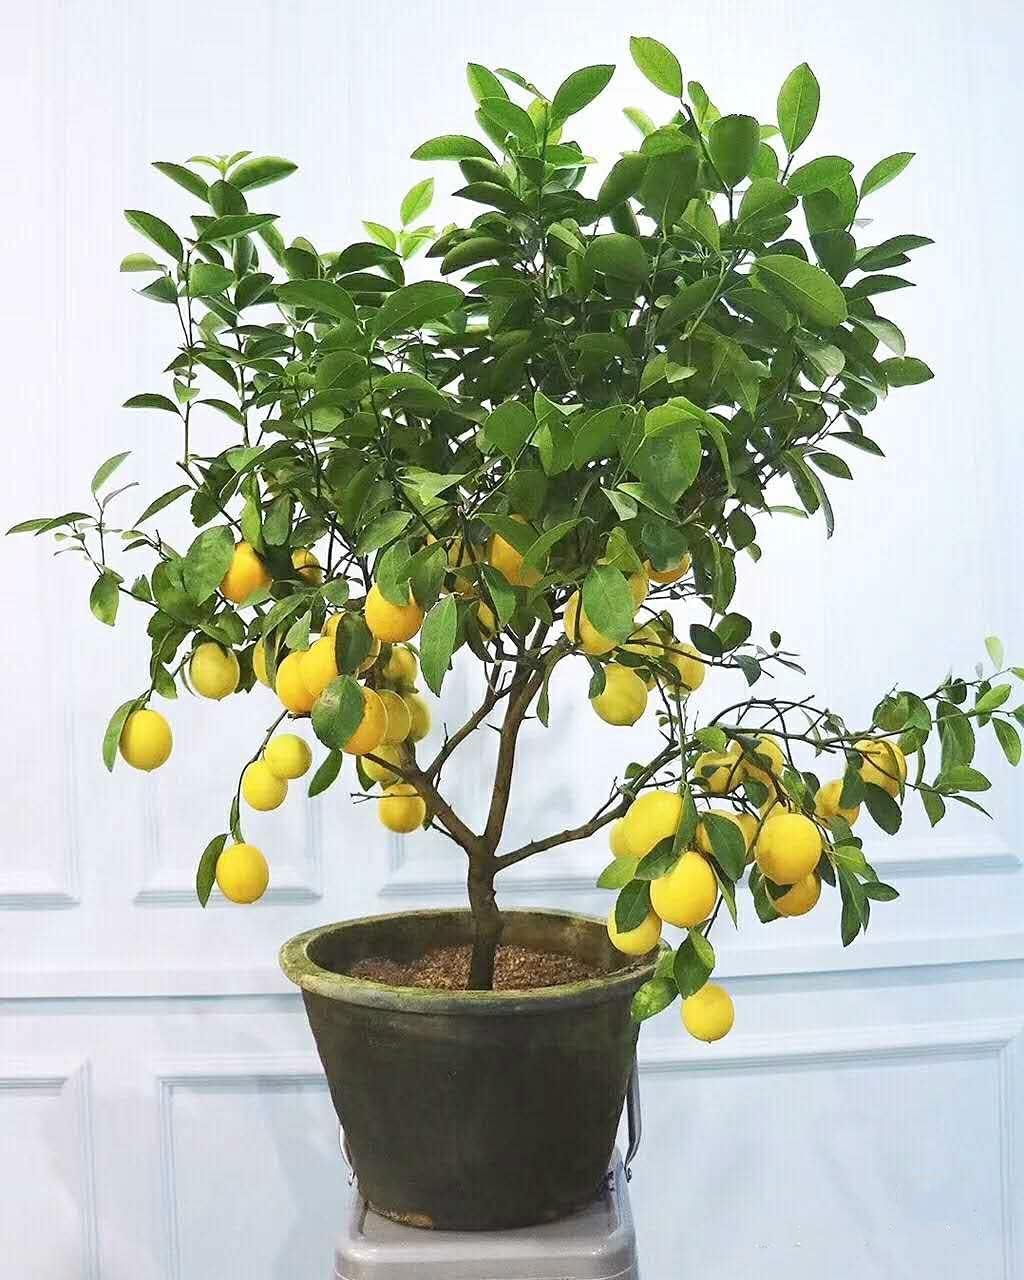 Lemon Seeds Lemon Tree Seeds Home Garden Plant DIY Bonsai (20 Seeds/Pack)